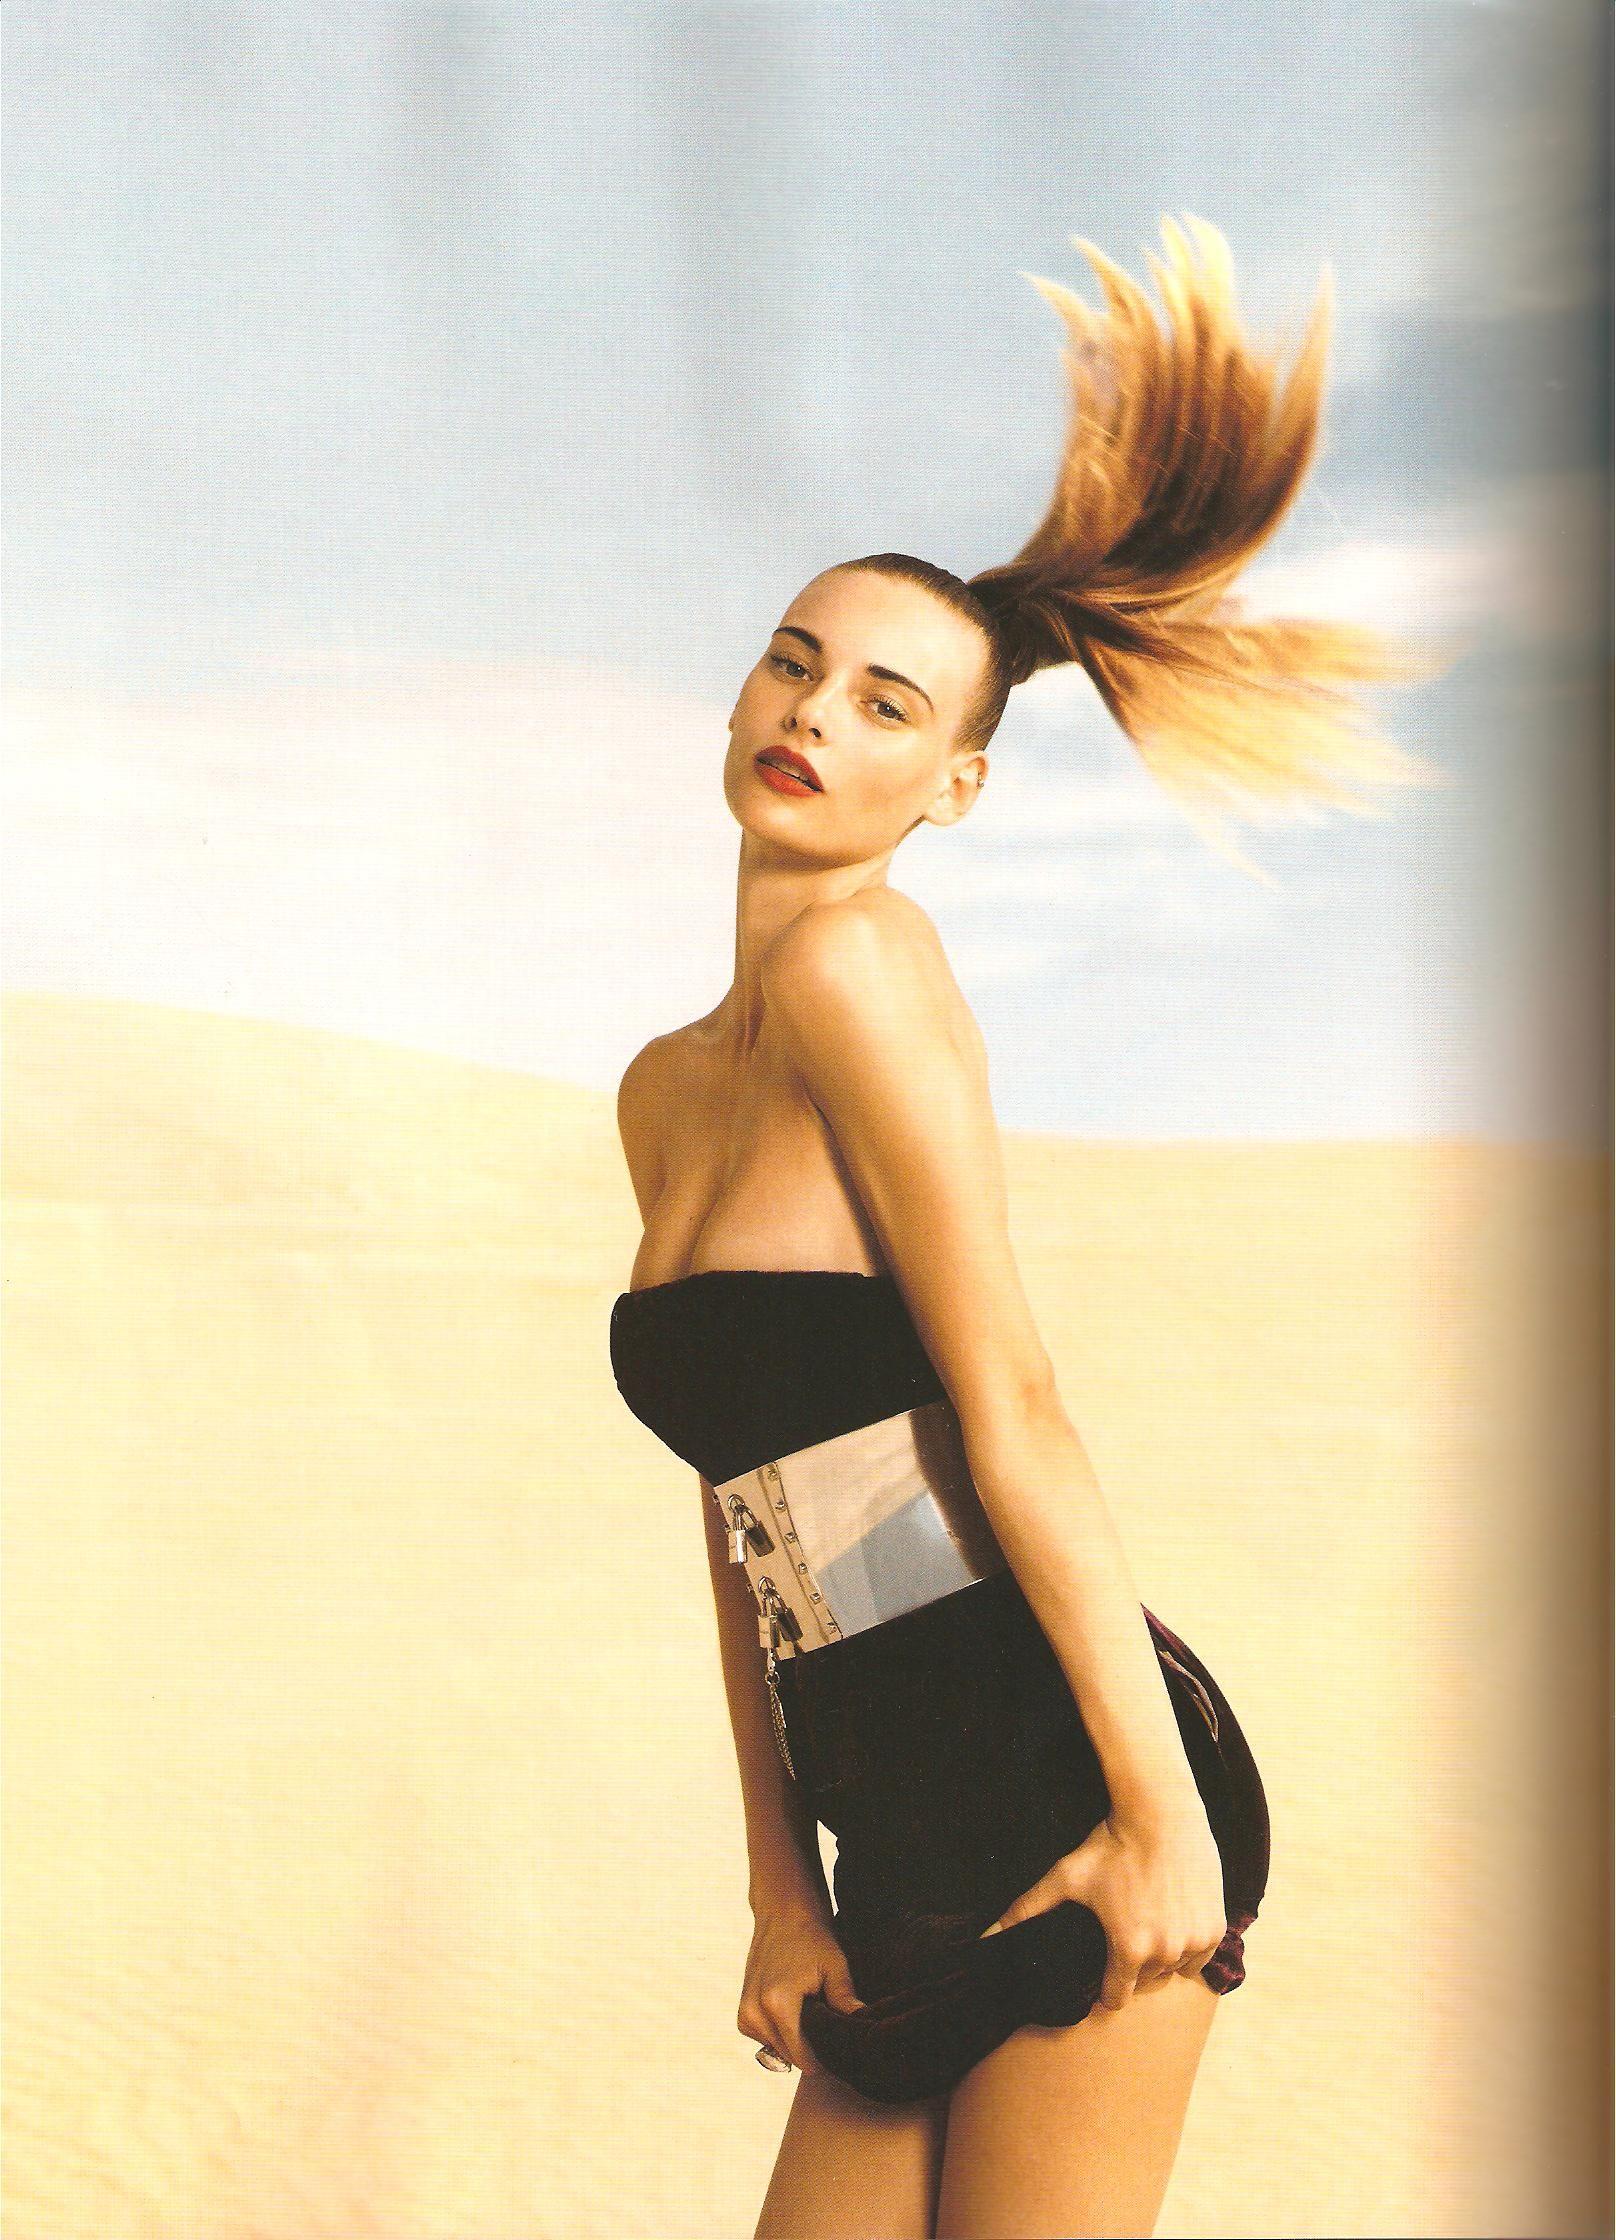 Nico bustos moda fashion international pinterest photography